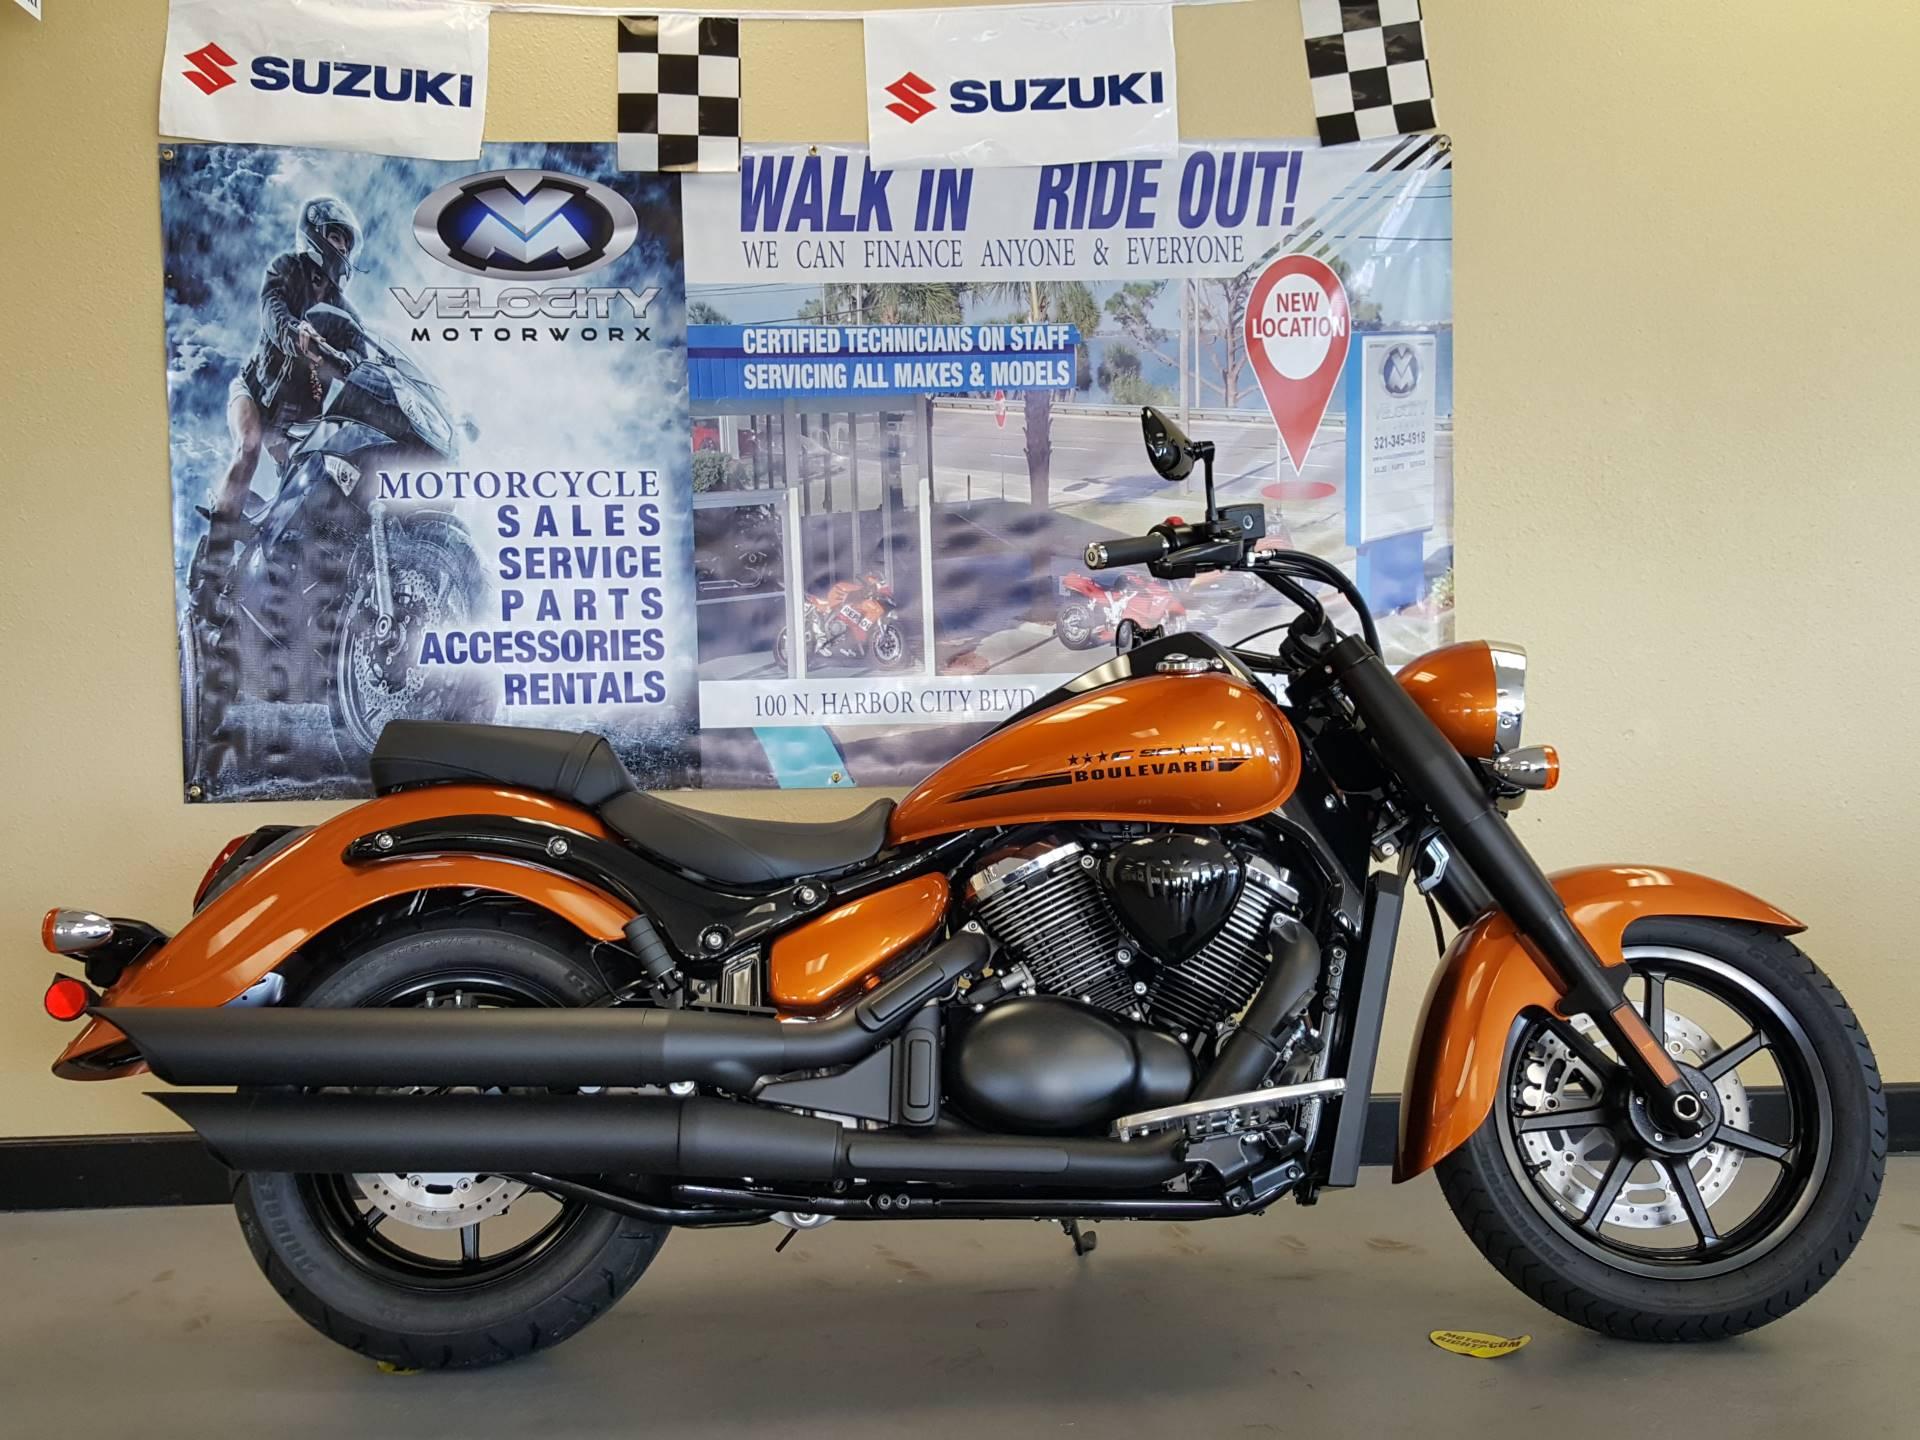 New 2017 Suzuki Boulevard C90 B.O.S.S. Motorcycles in Melbourne, FL ...